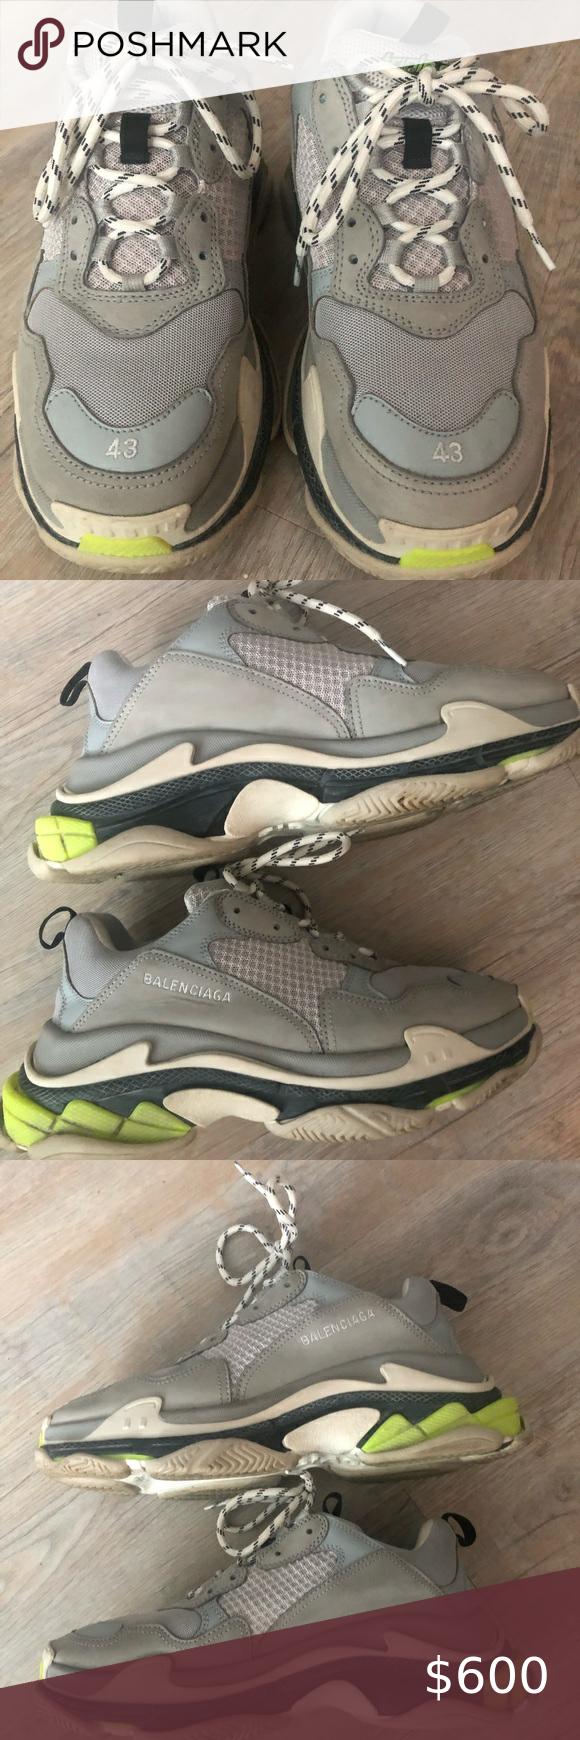 Balenciaga Triple S sneakers size 43 in